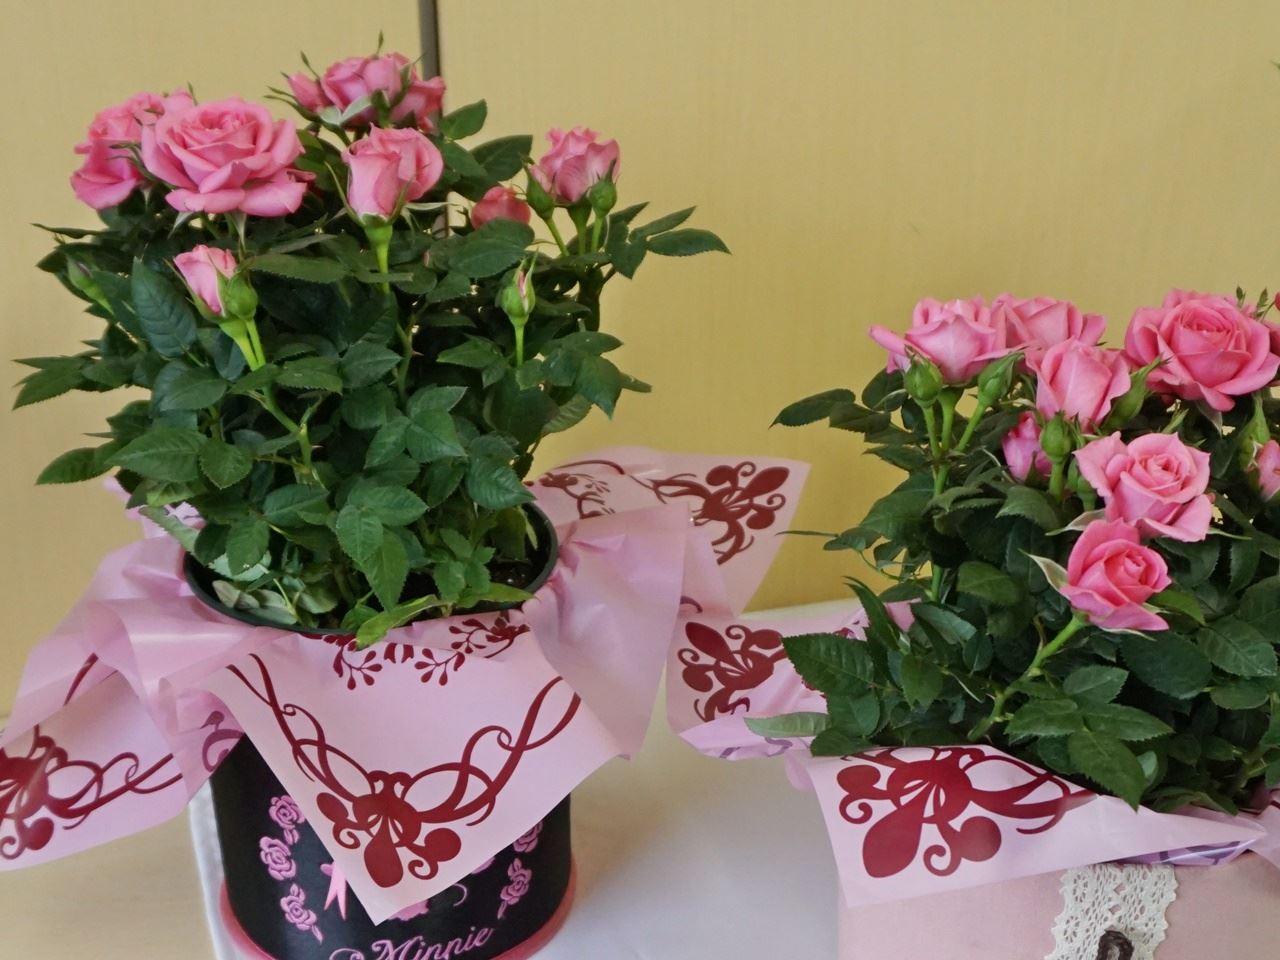 【e87】母の日 鉢植え母の日 鉢植え「ミニバラ セントラルキューティー」と母の日 ディズニー 鉢植え「ローズバスケット(ミニー)」